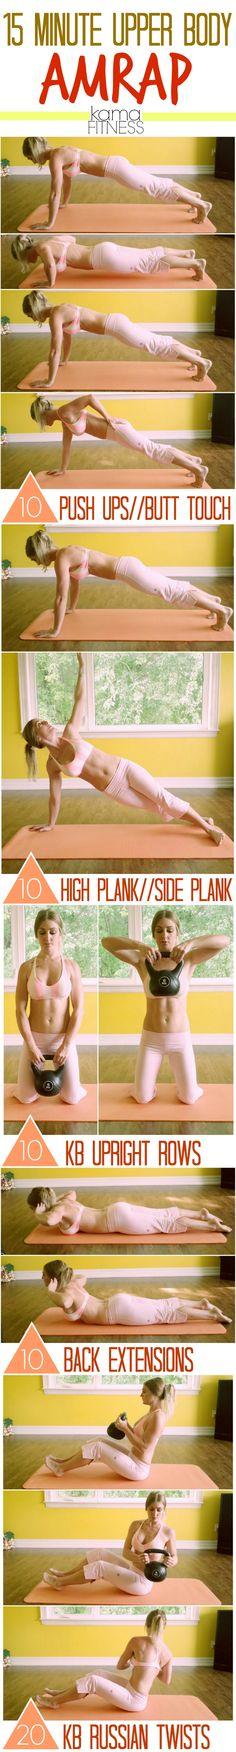 15-minute-upper-body-amrap-workout-kama-fitness